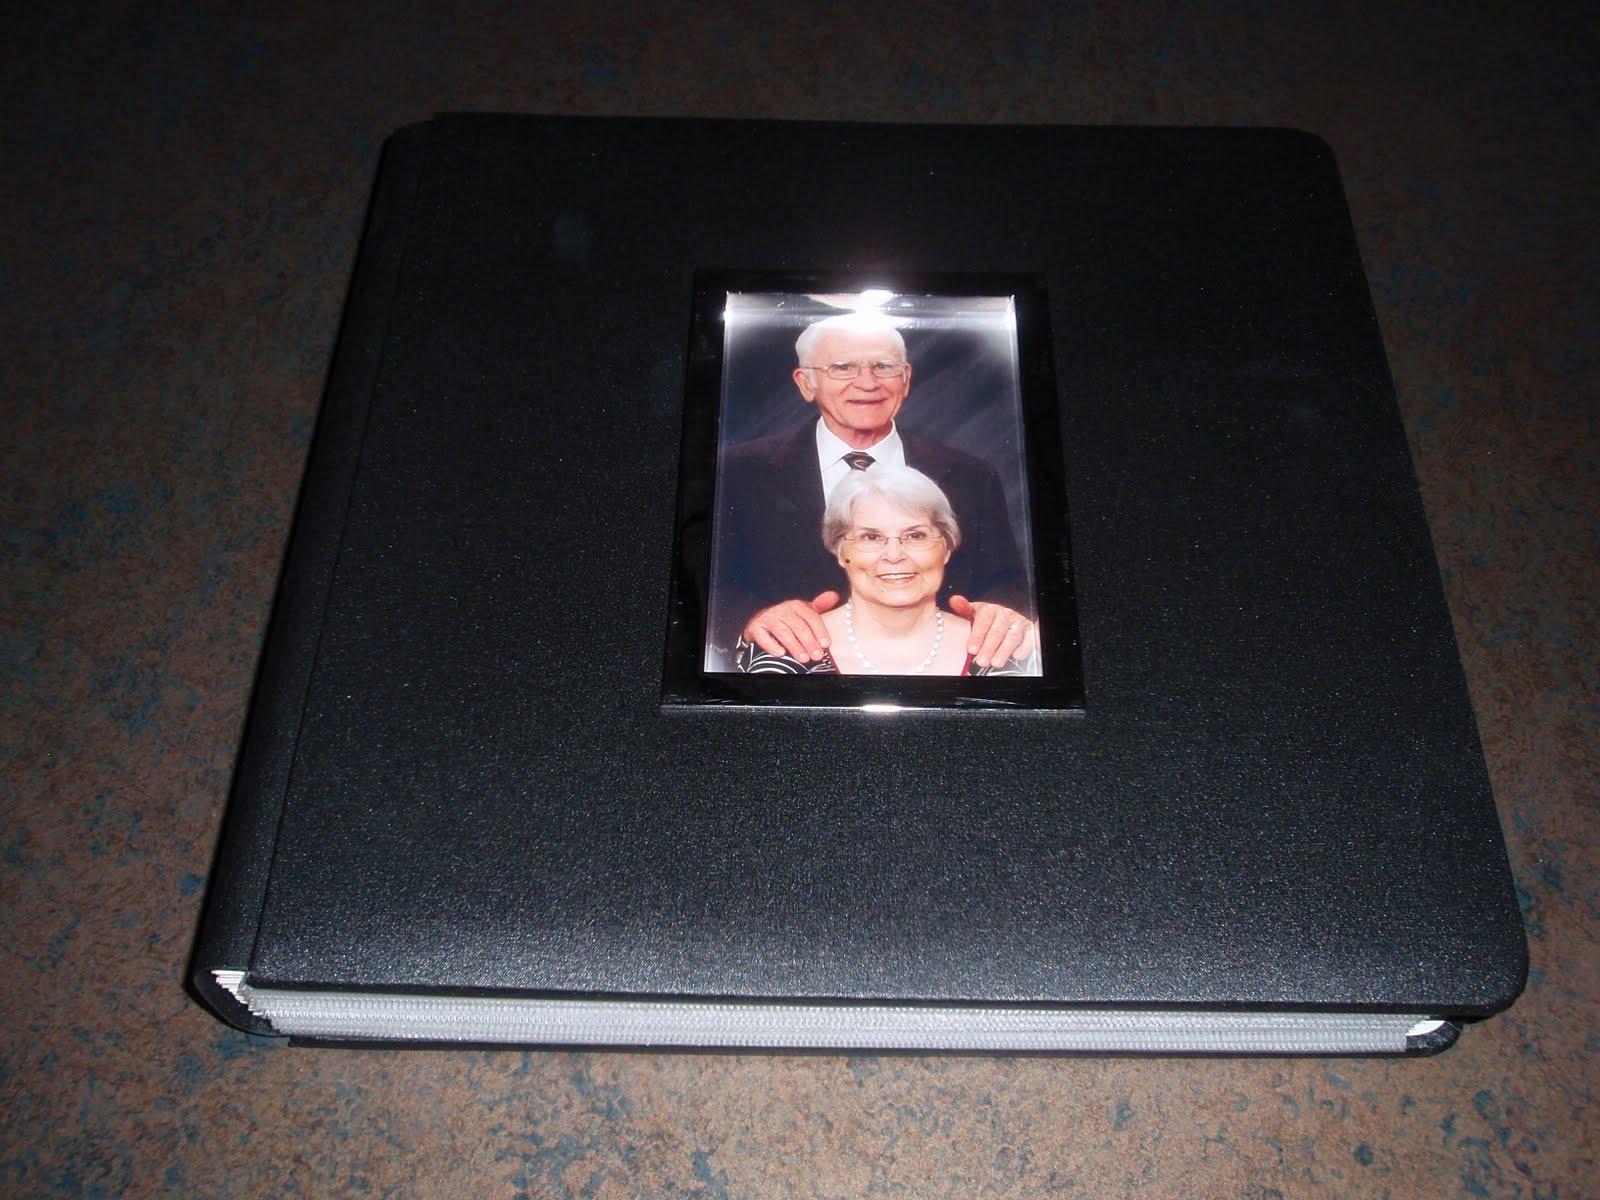 Scrapbook ideas for anniversary - 50th Wedding Anniversary Scrapbooking Ideas